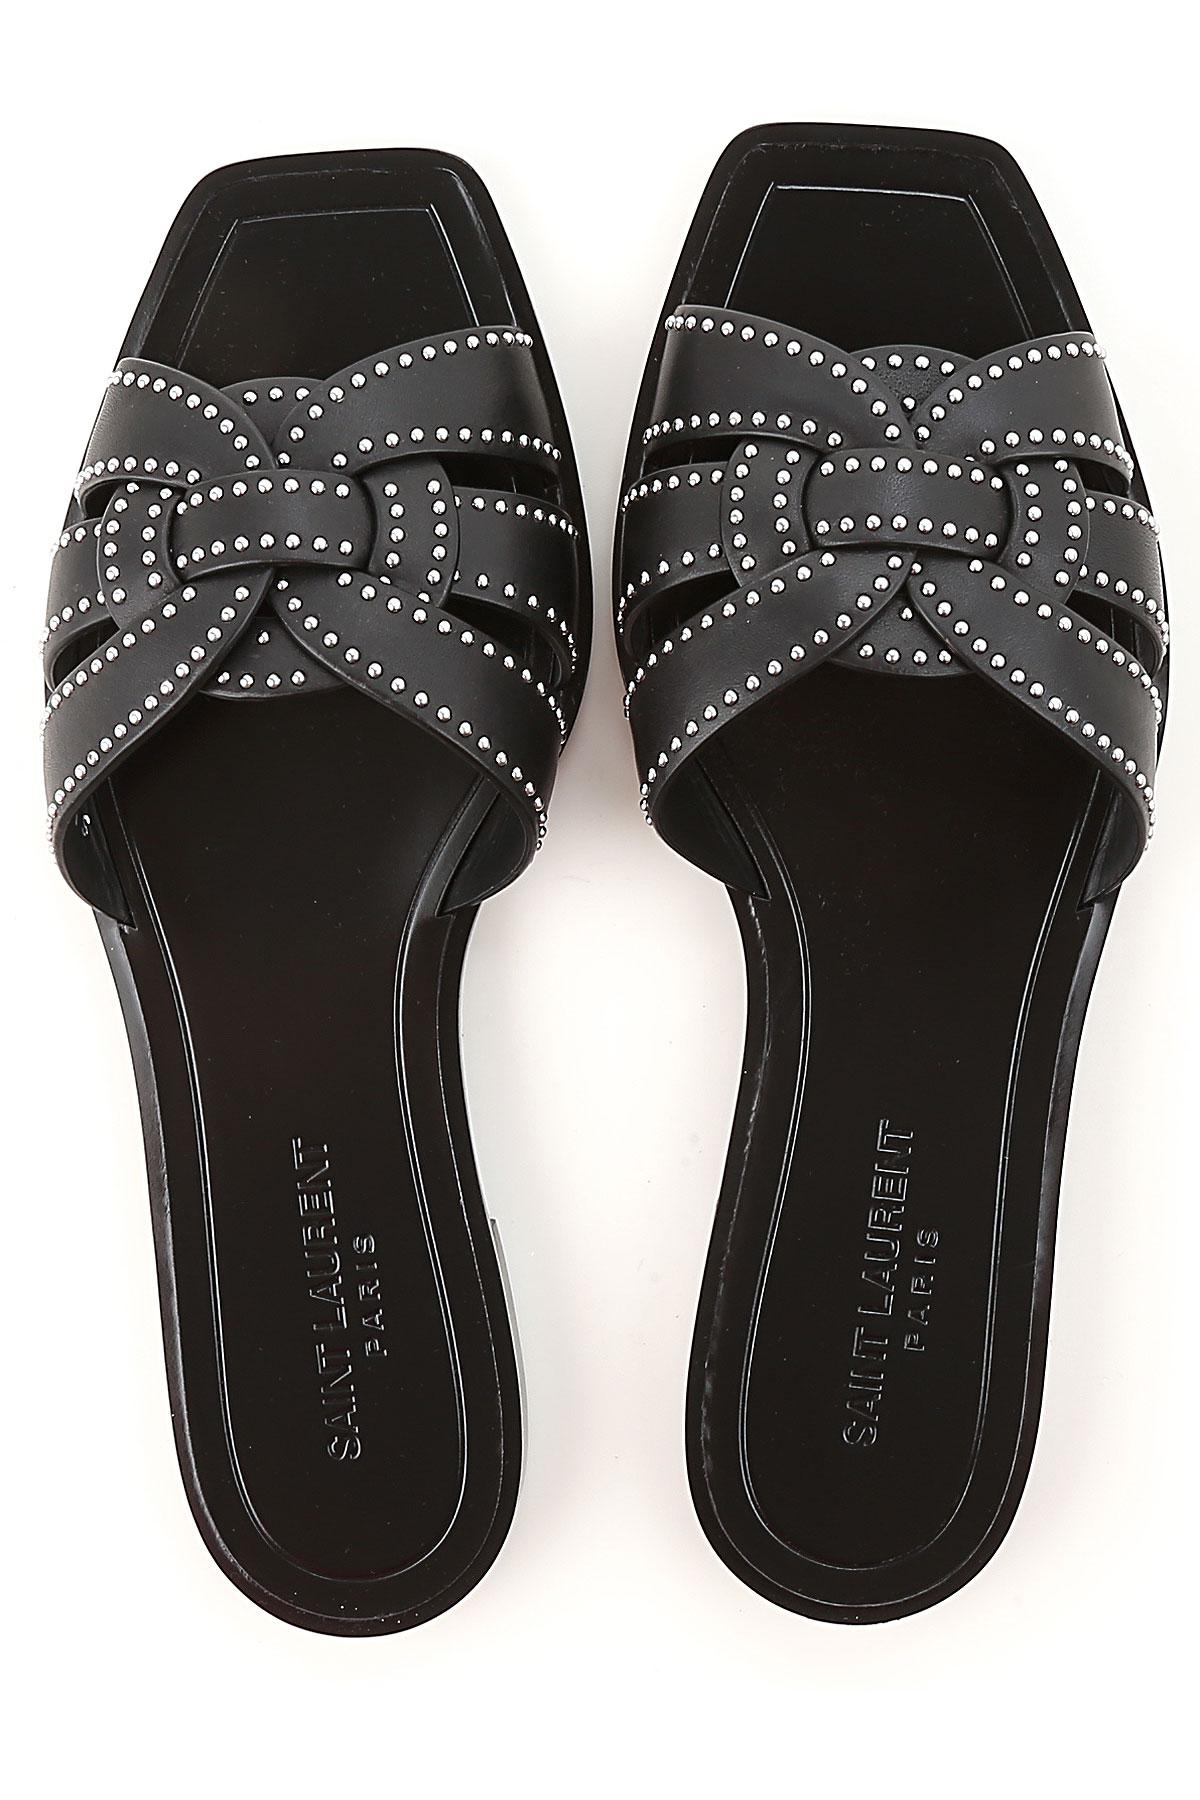 2019 Negro nbsp; verano Zapatos Mujer Para Laurent Saint Primavera 4HUTqpfy